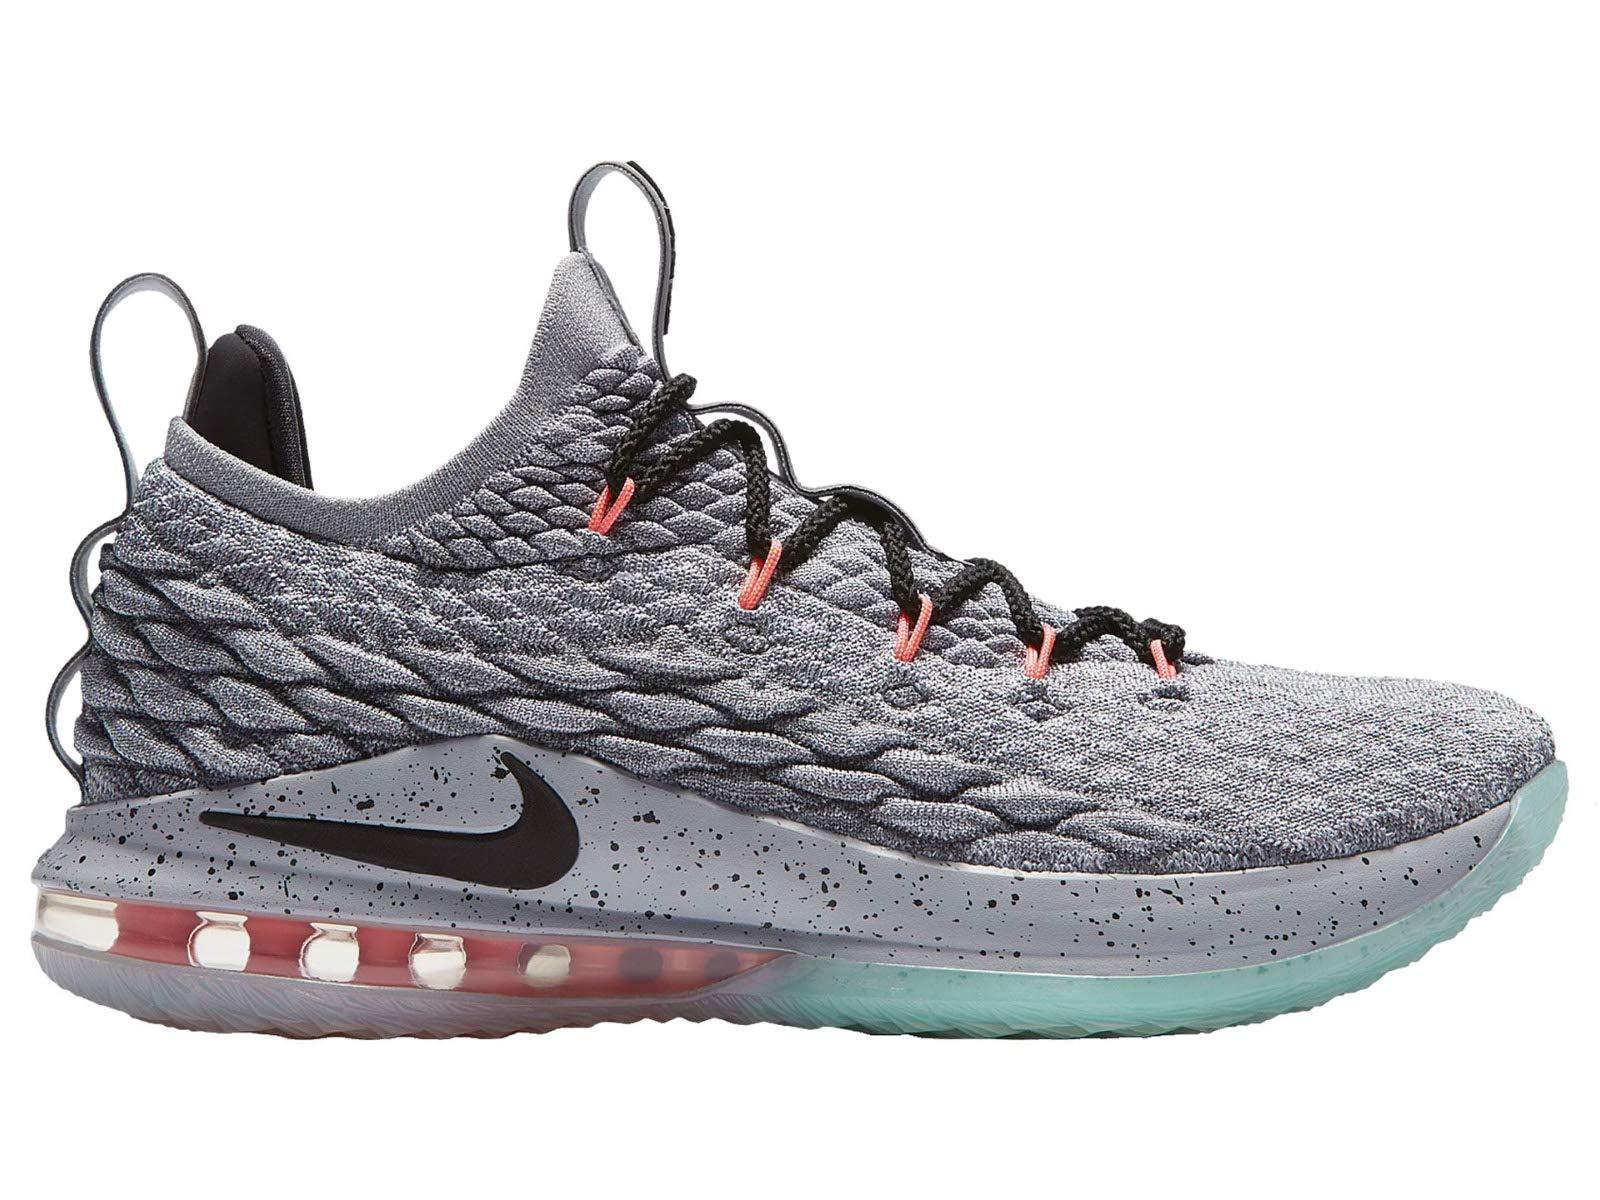 7247d0c02301 NIKE Lebron 15 Low - Men s Lebron James Nylon Basketball Shoes 10.5 D(M)